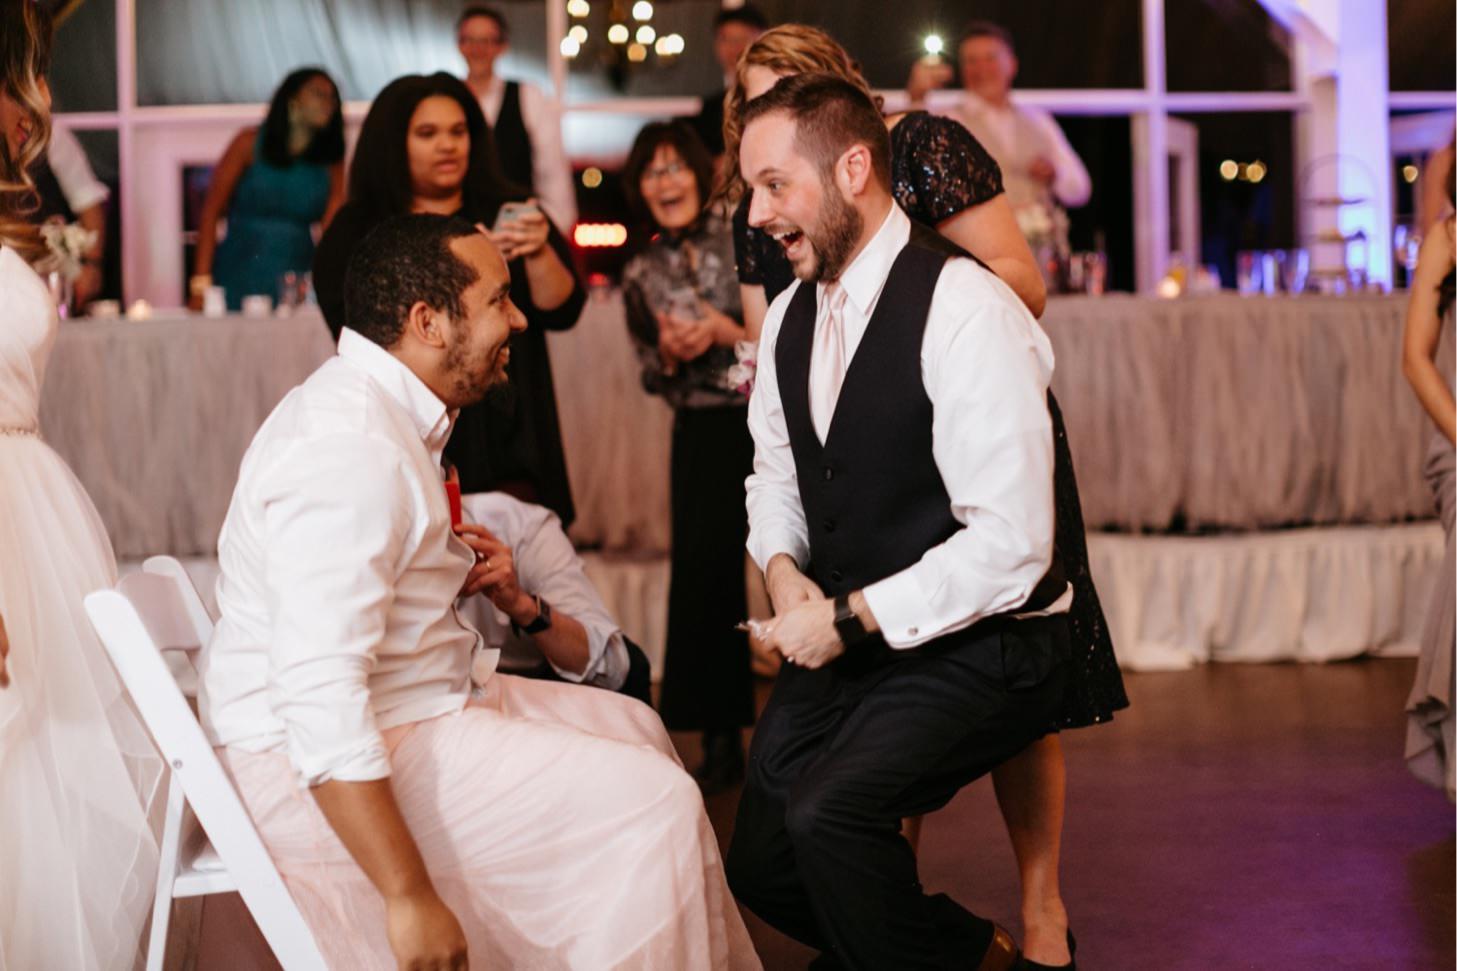 ritz-charles-wedding-reception-downtown-indianapolis-wedding-photographer077.JPG